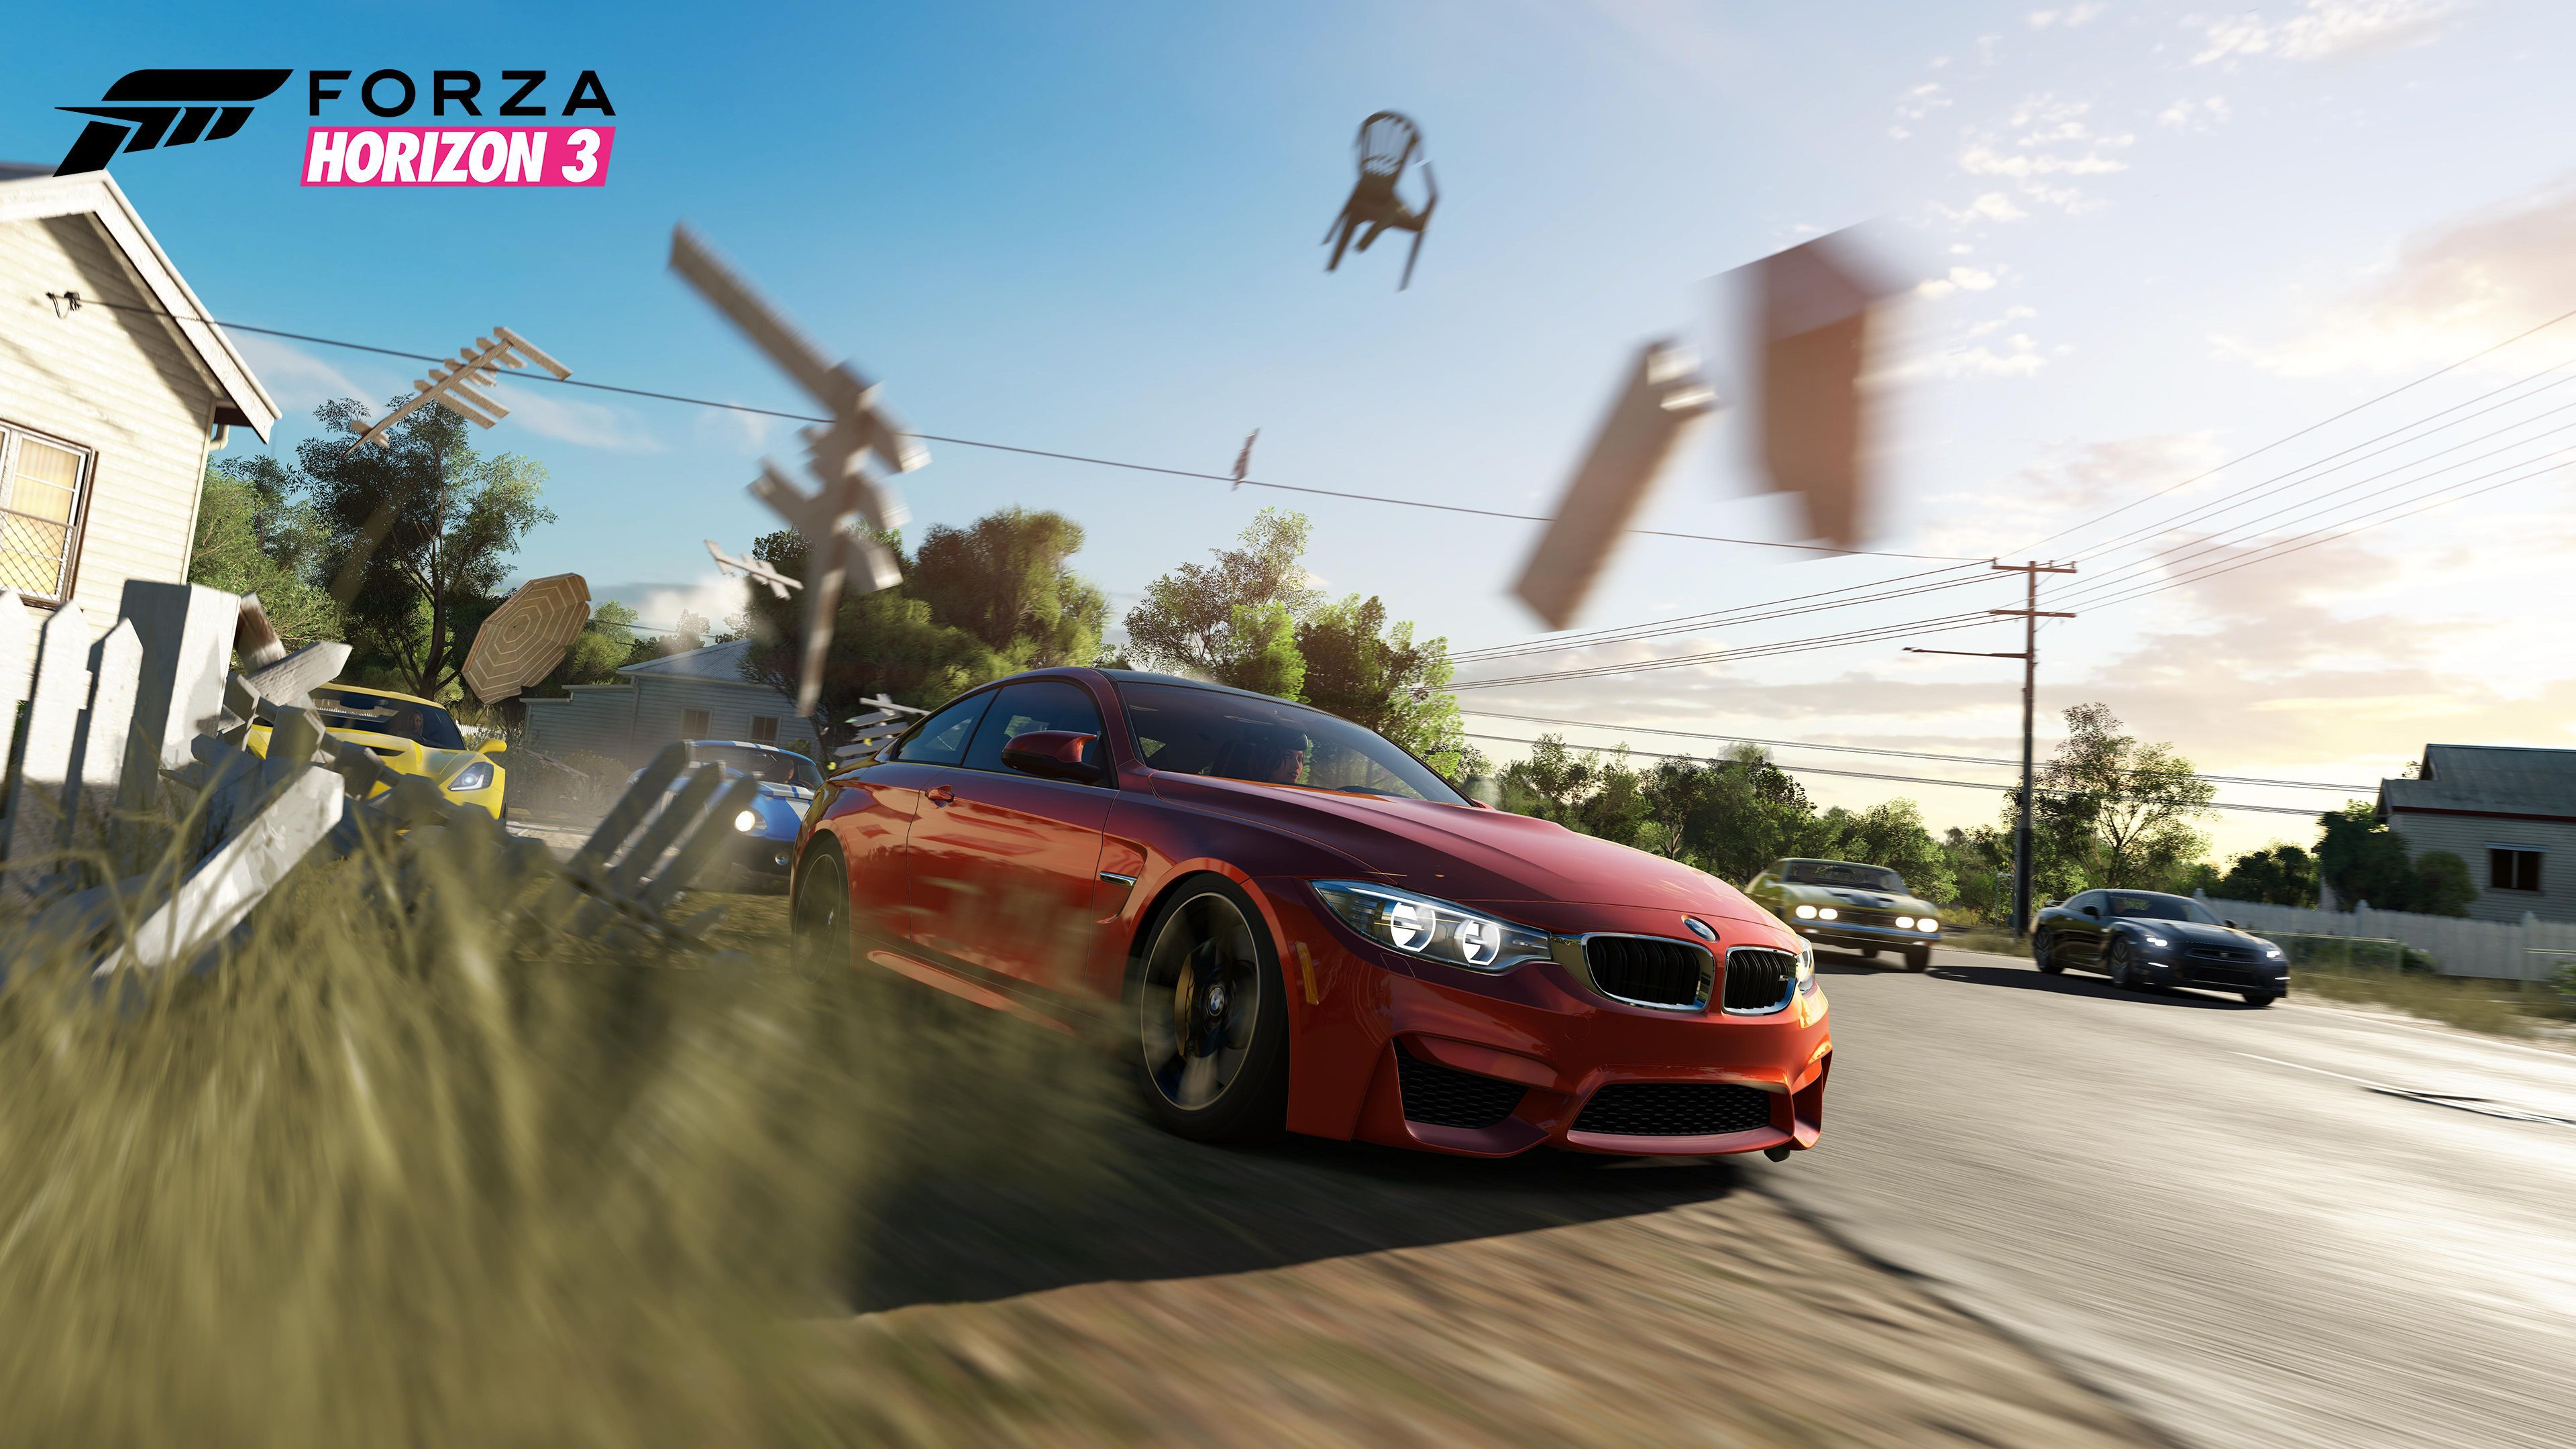 Forza Horizon 3 HD Wallpaper